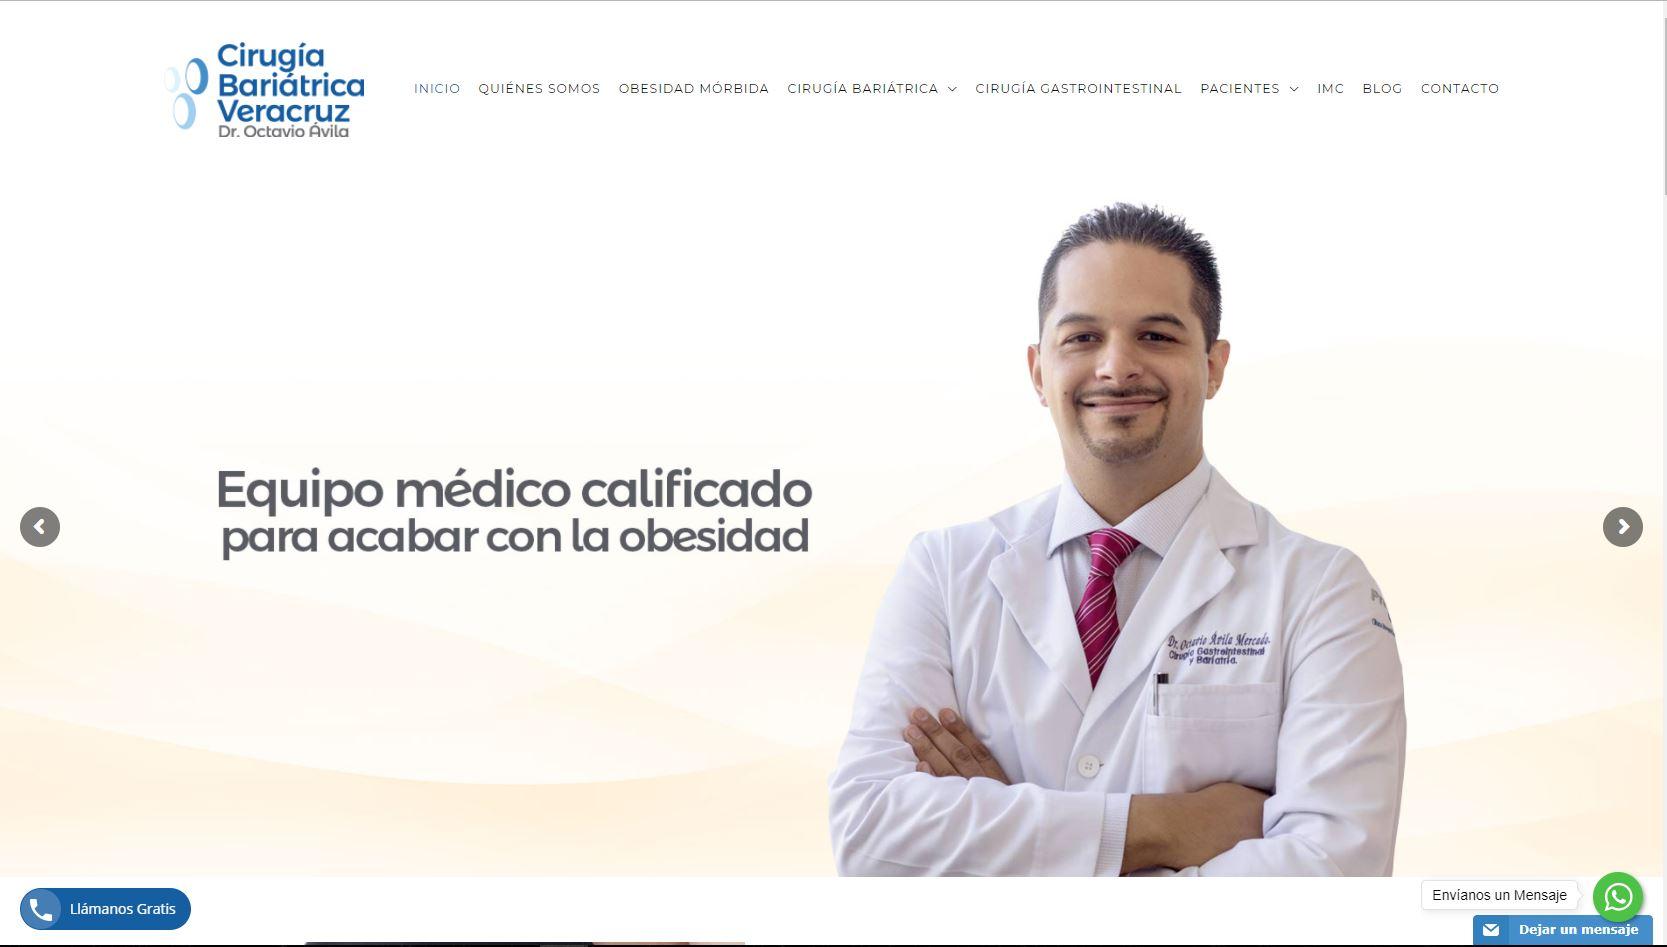 Cirugía Bariátrica Veracruz